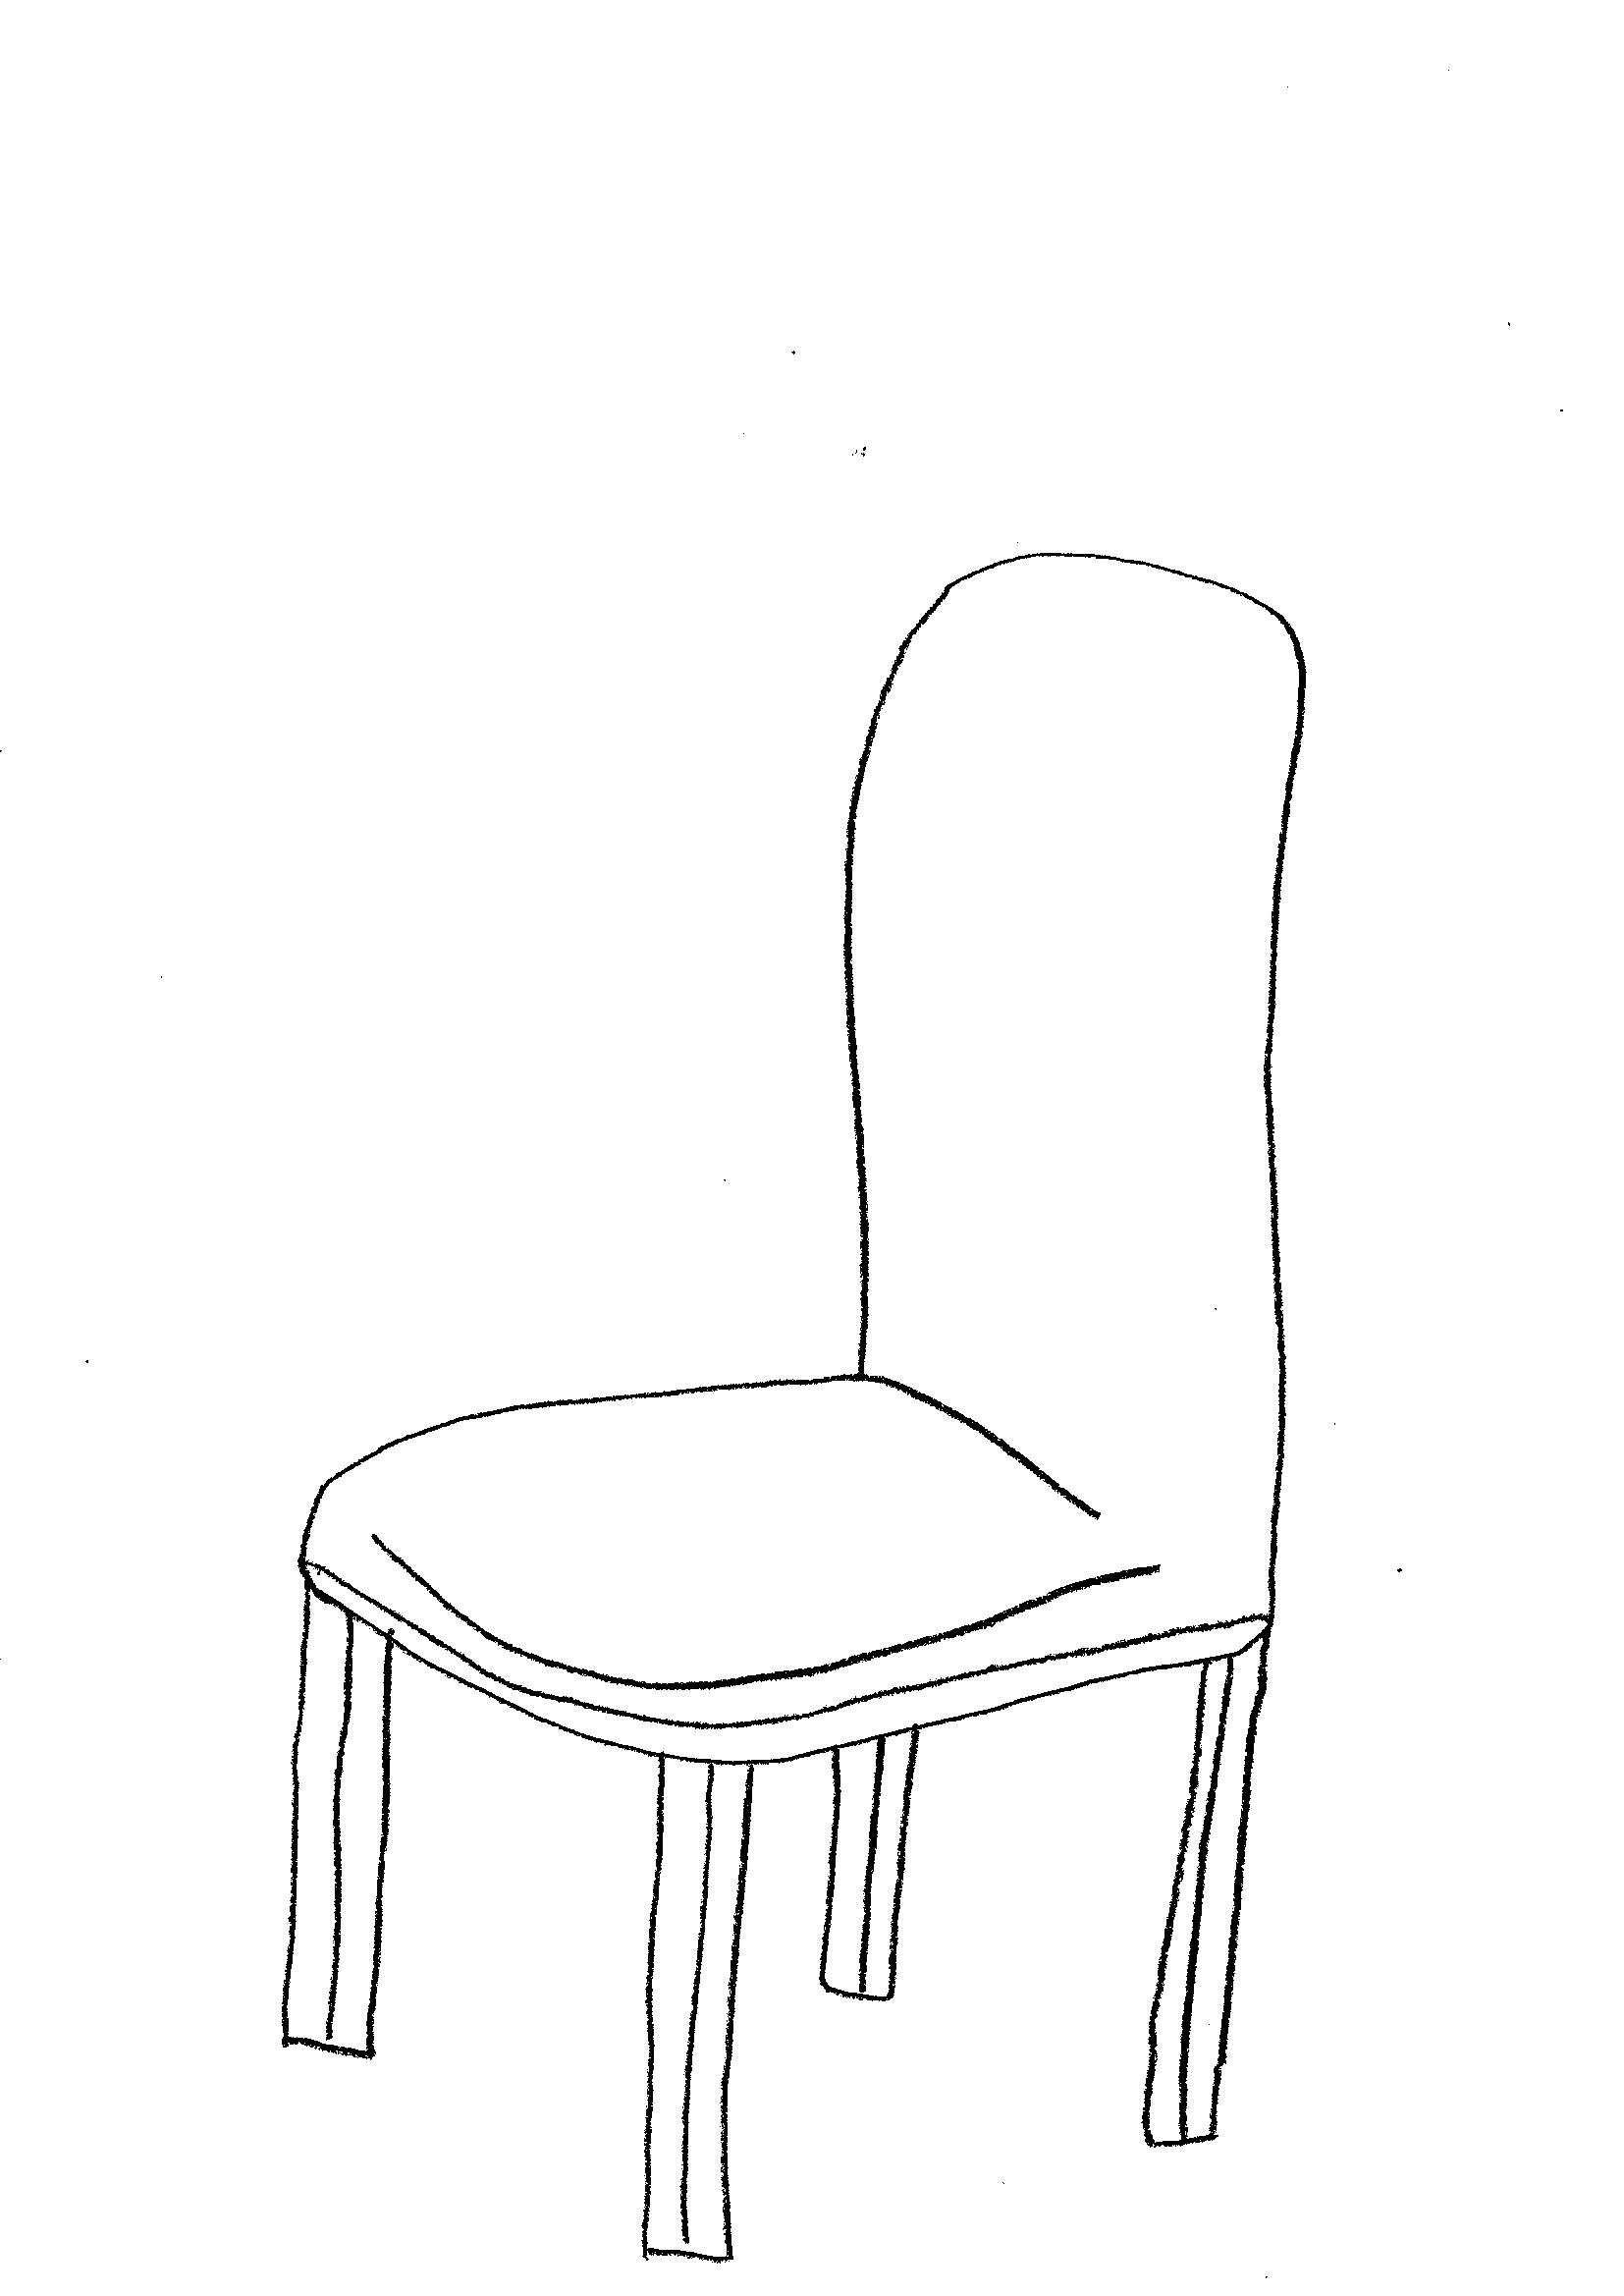 disegno sedie bambini